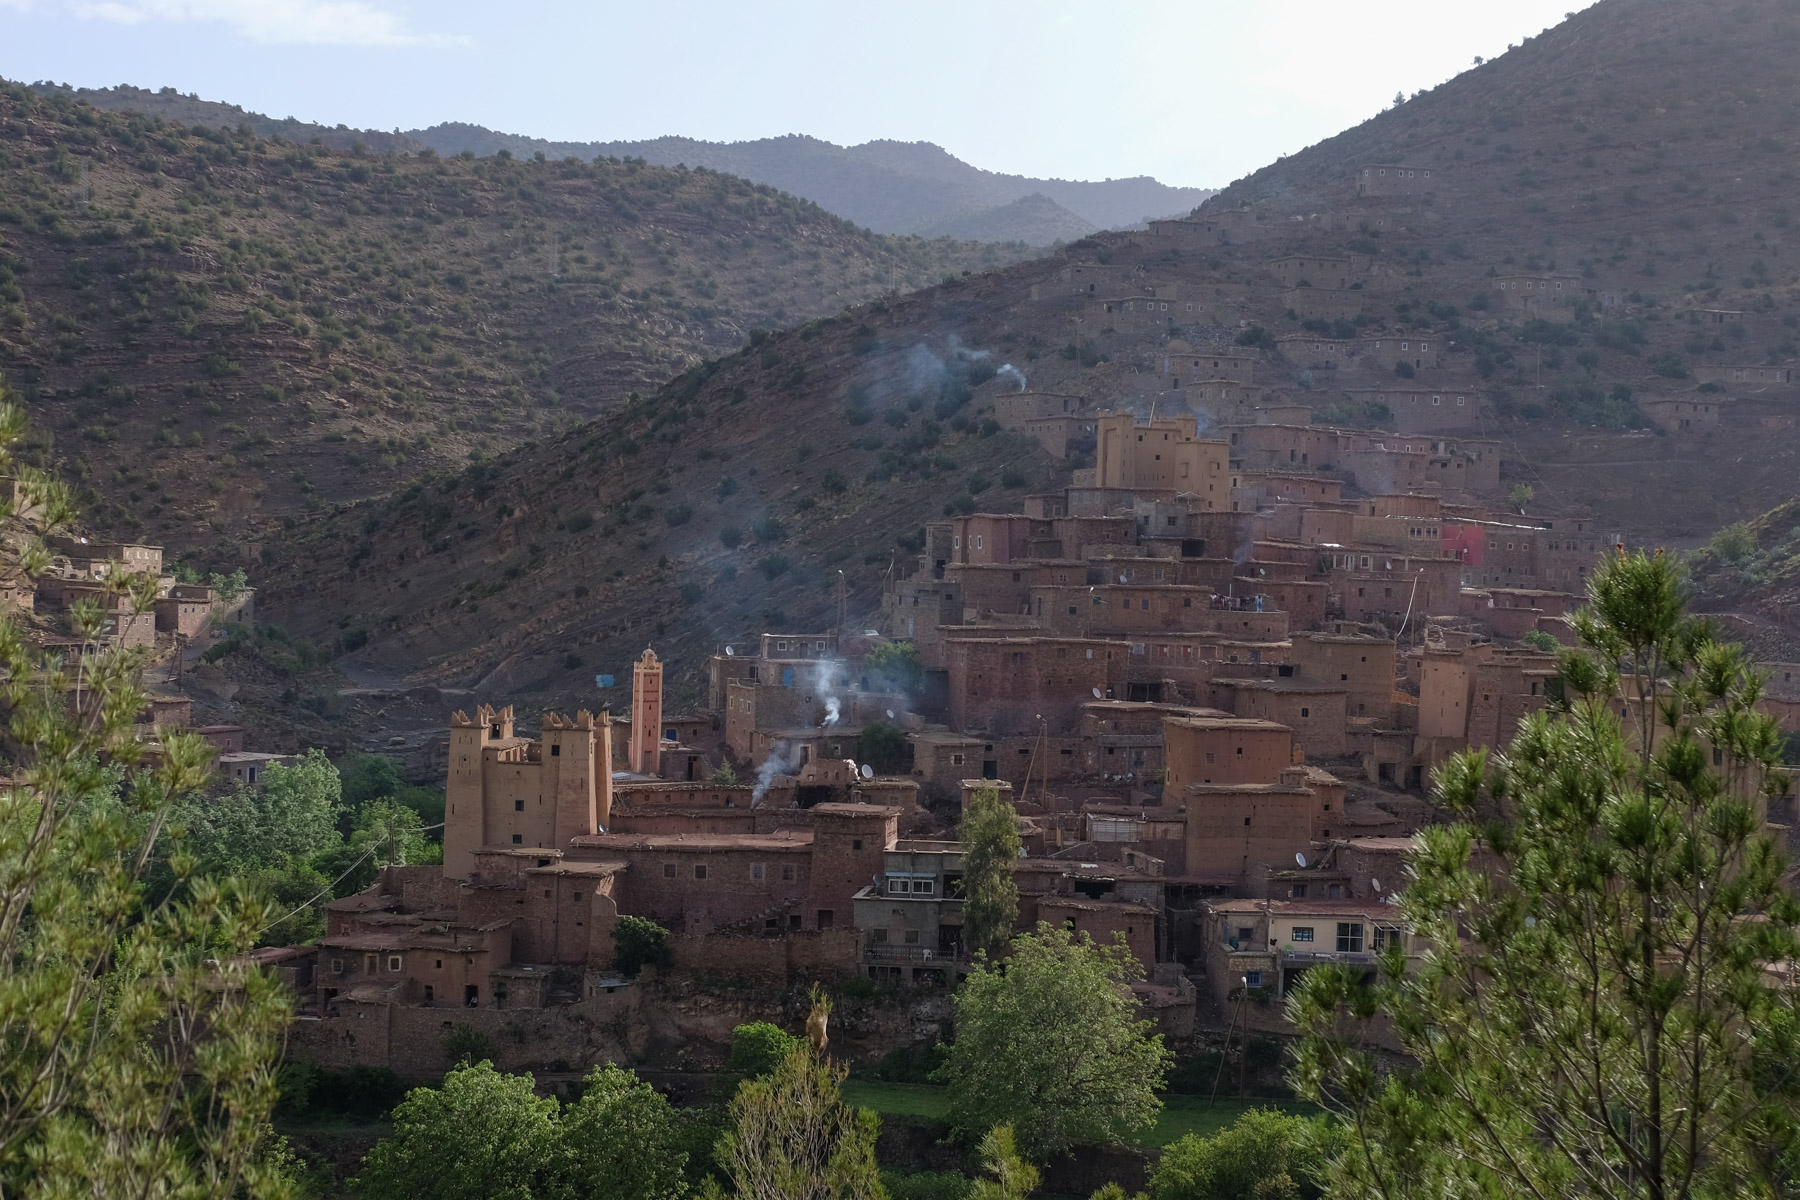 Aroudane, Zaouia Ahansal, Maroc 7